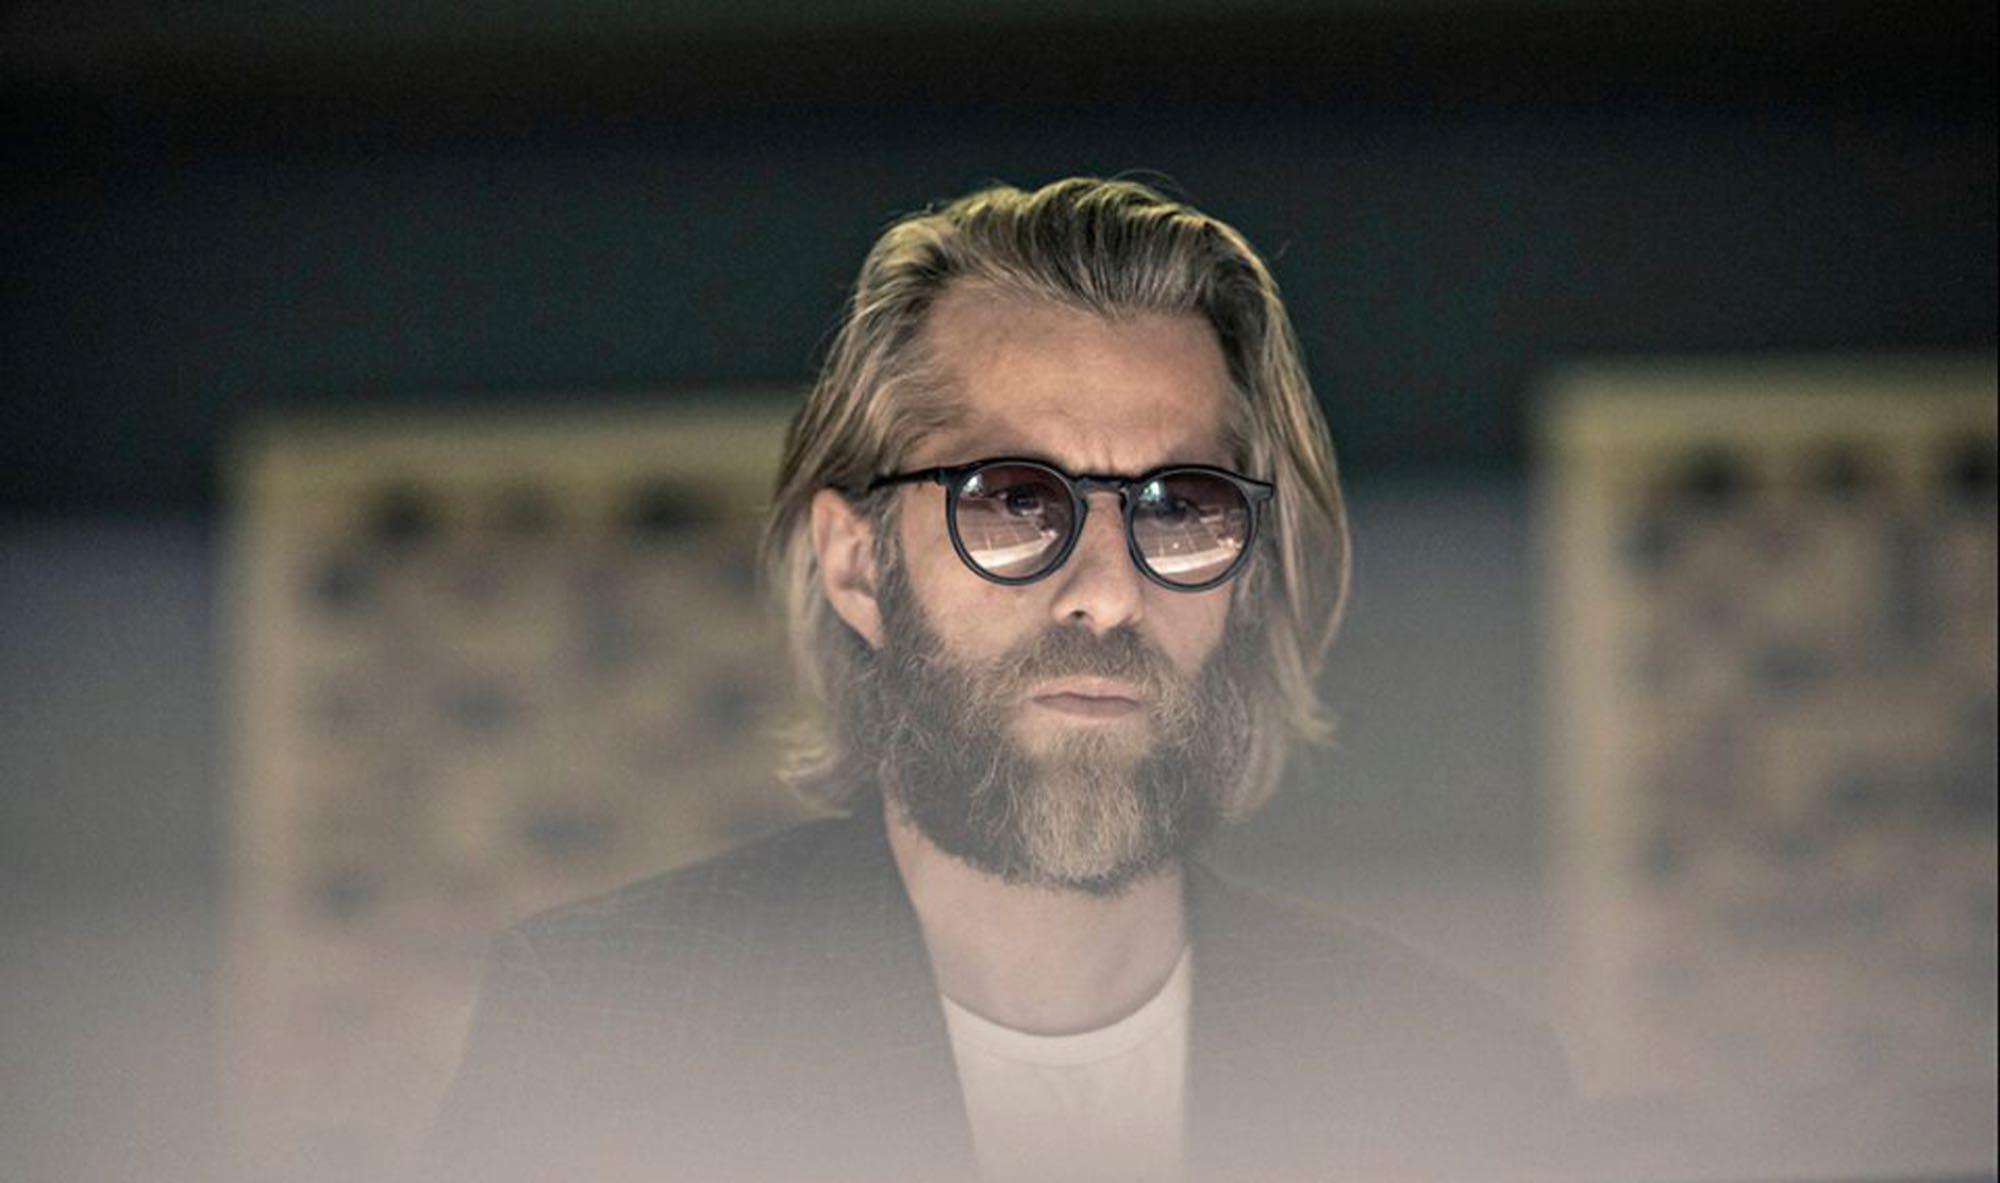 Le DJ électro Andrew Claristide. © Philippe Levy